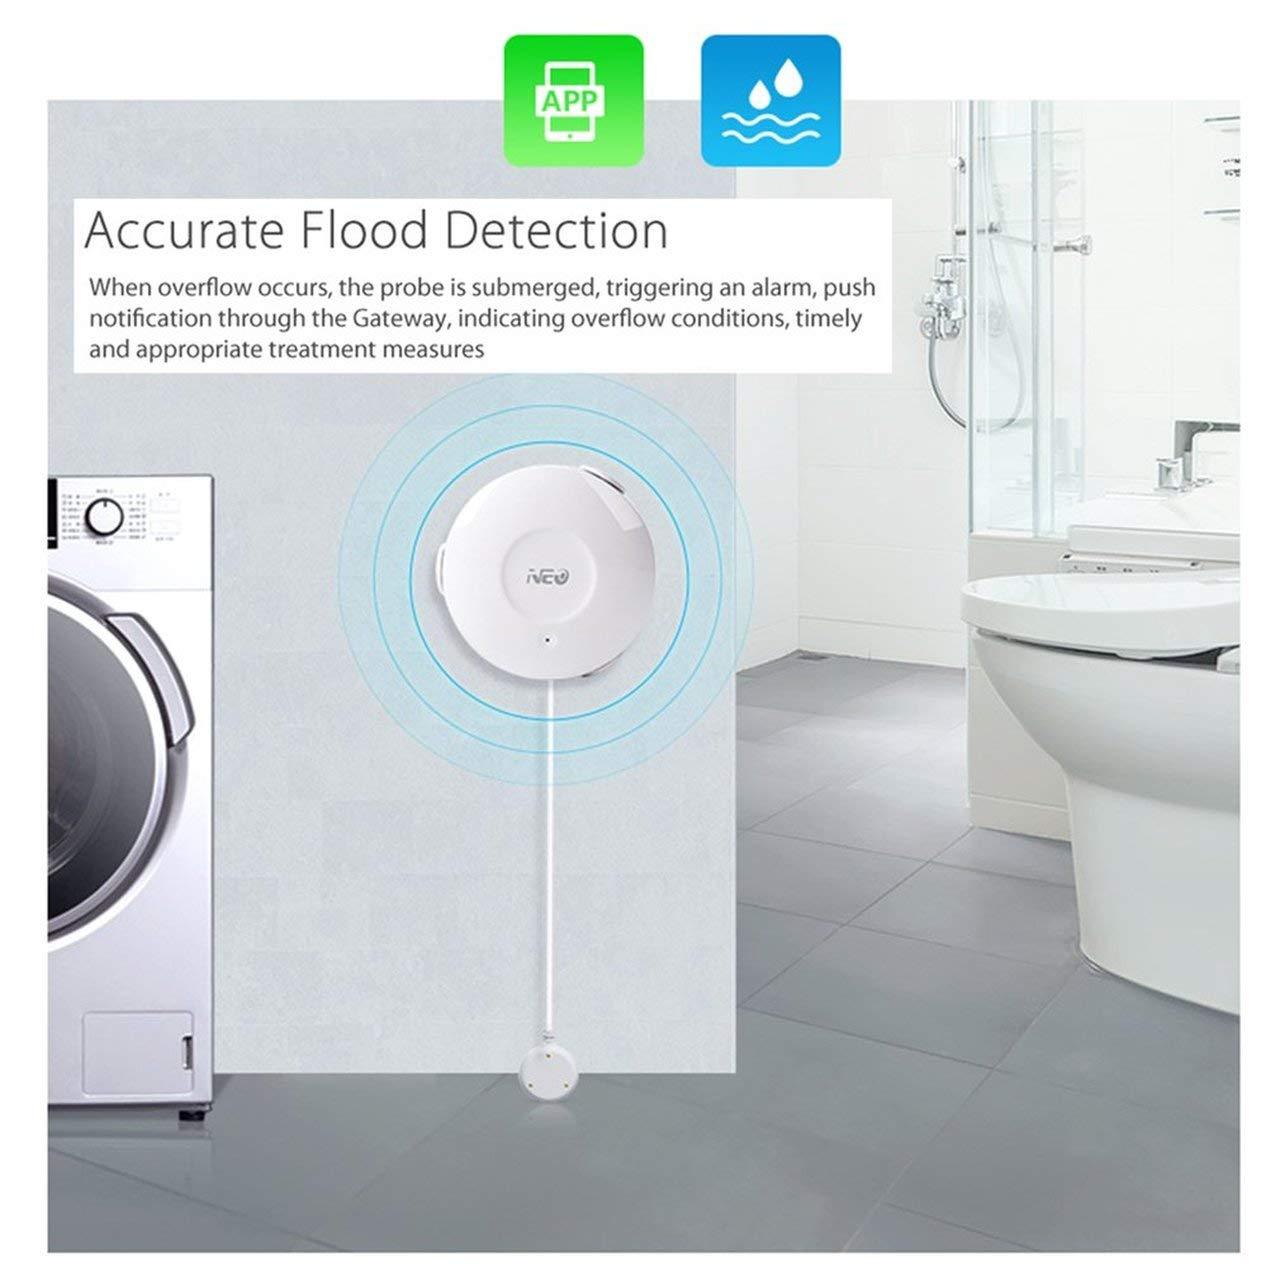 NAS-WS02W Smart Water Sensor WiFi Flood Sensor Home Automatic Alarm System Leak Detector App Notification No Hub Operated